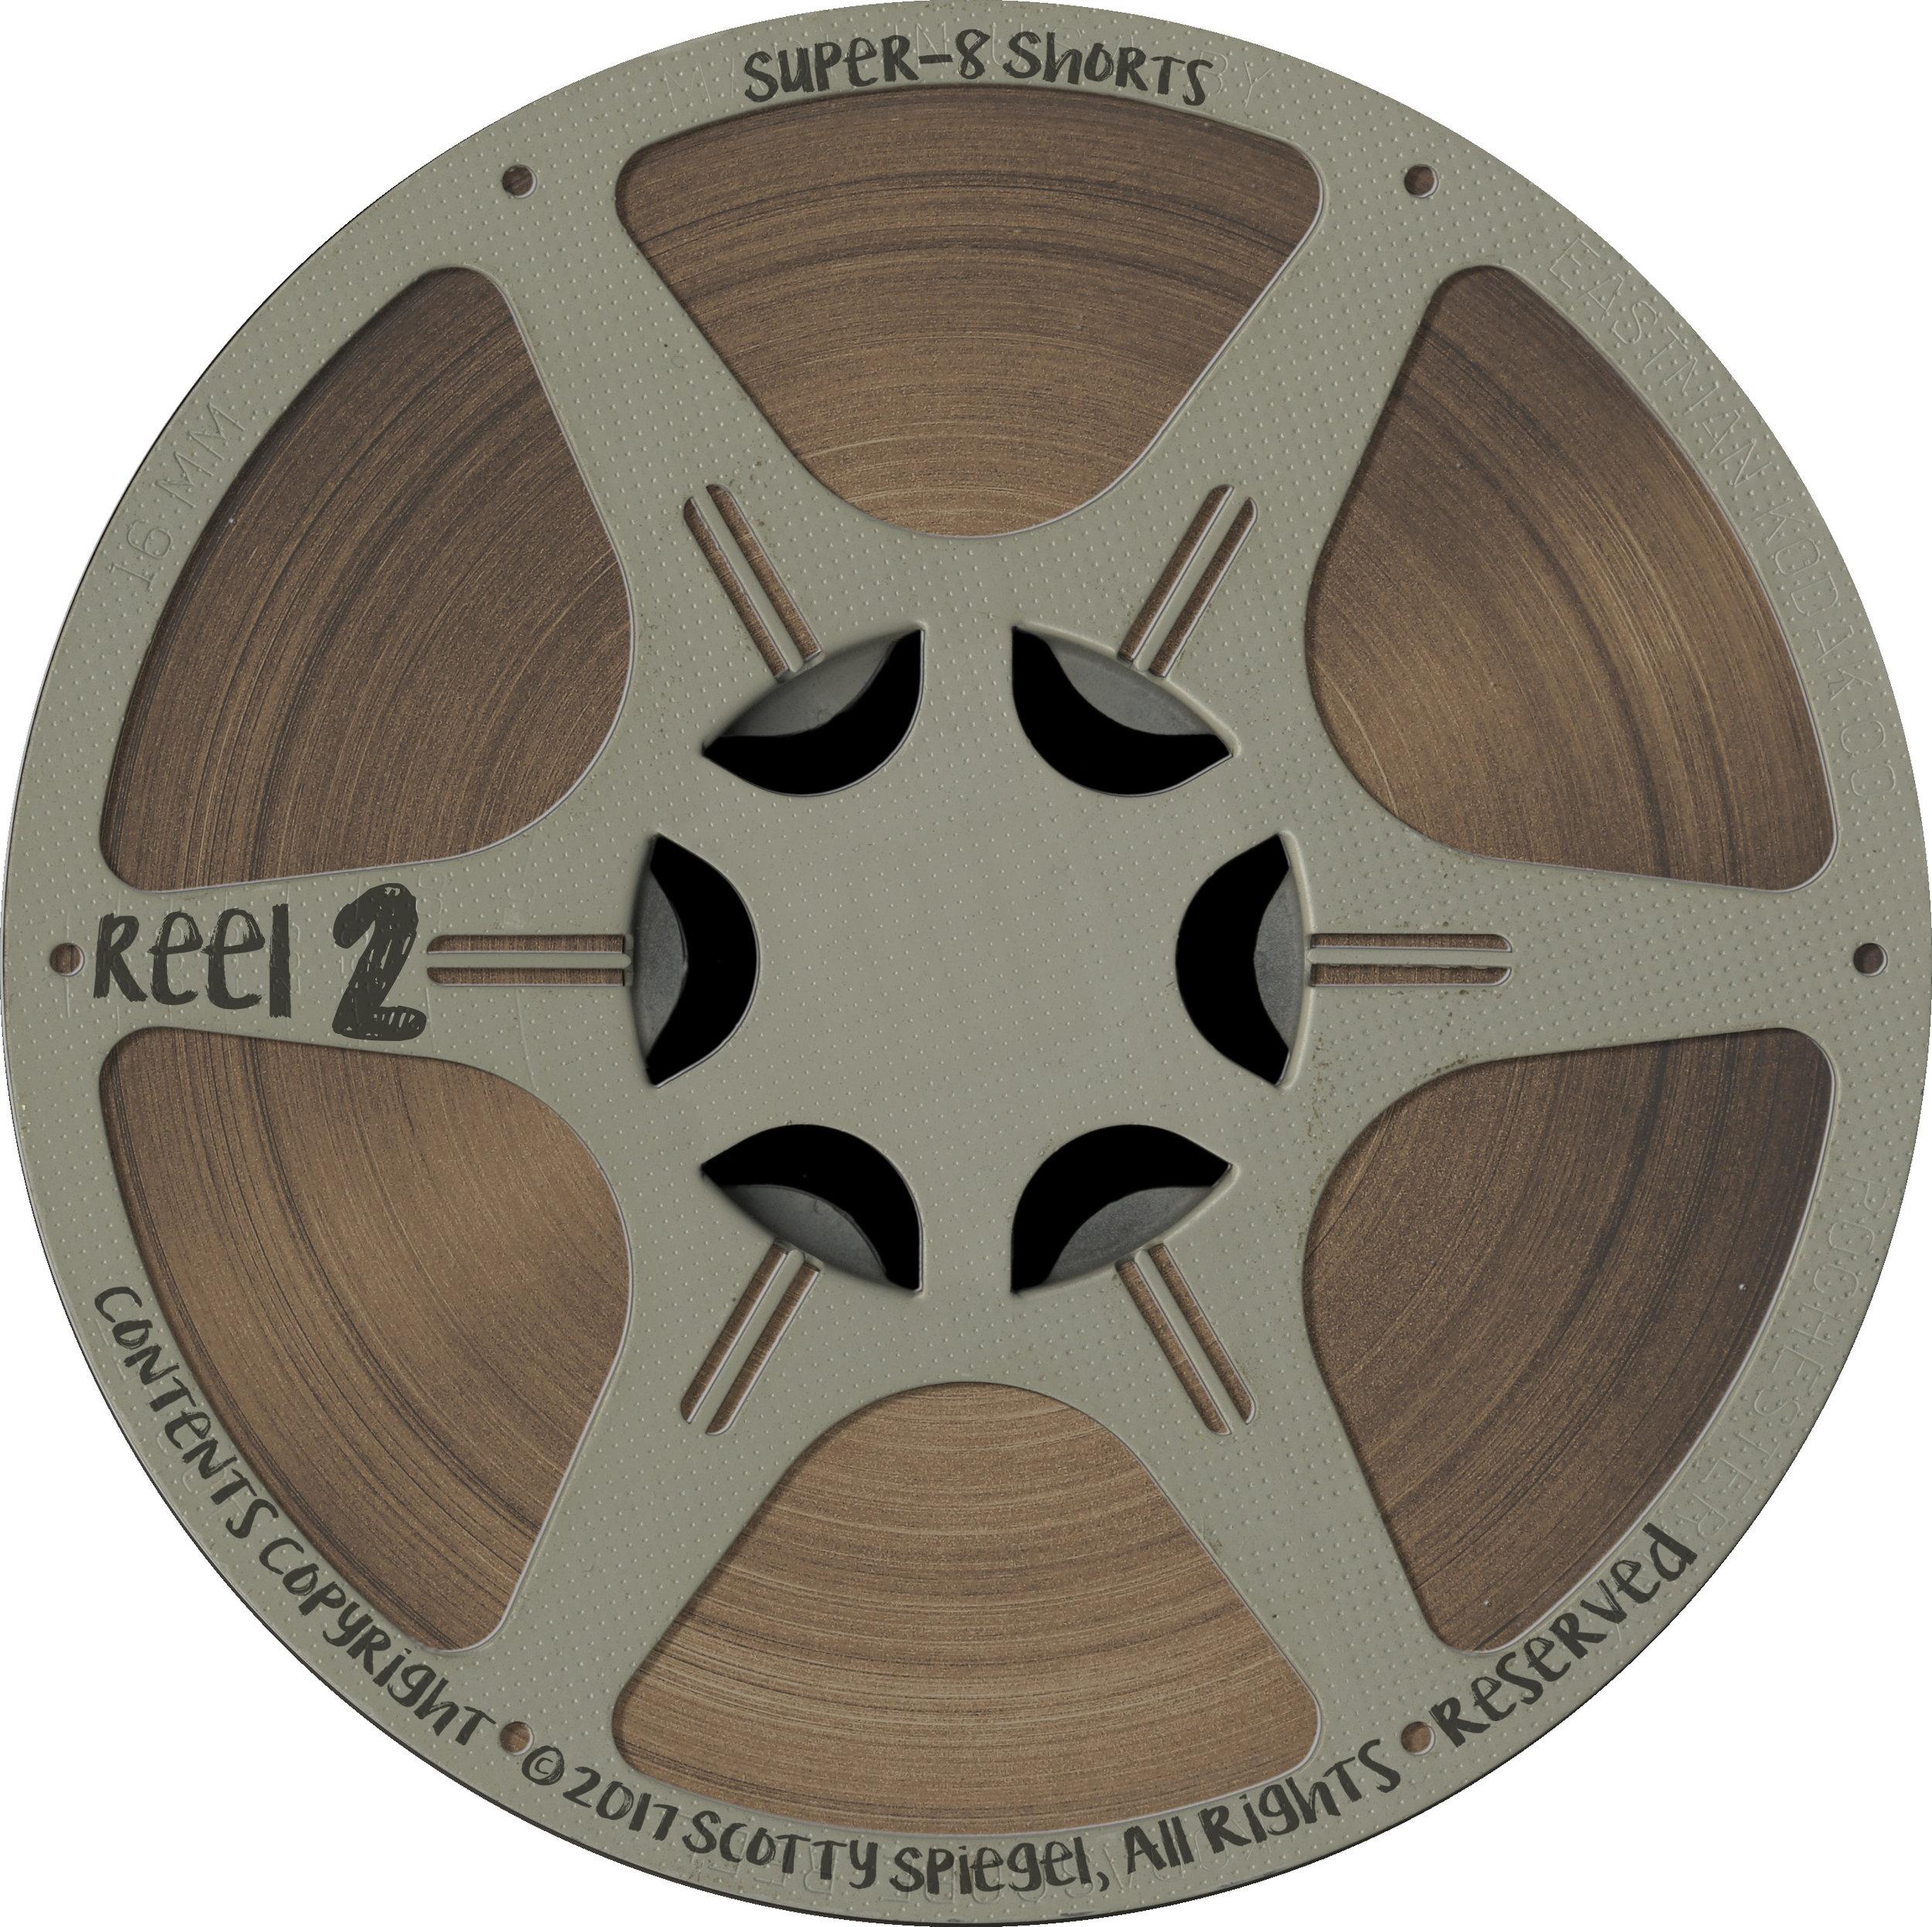 The Evil Dead Super-8 Short Films DVD2 Disc Art (2741px by 2734px - 600dpi).jpg